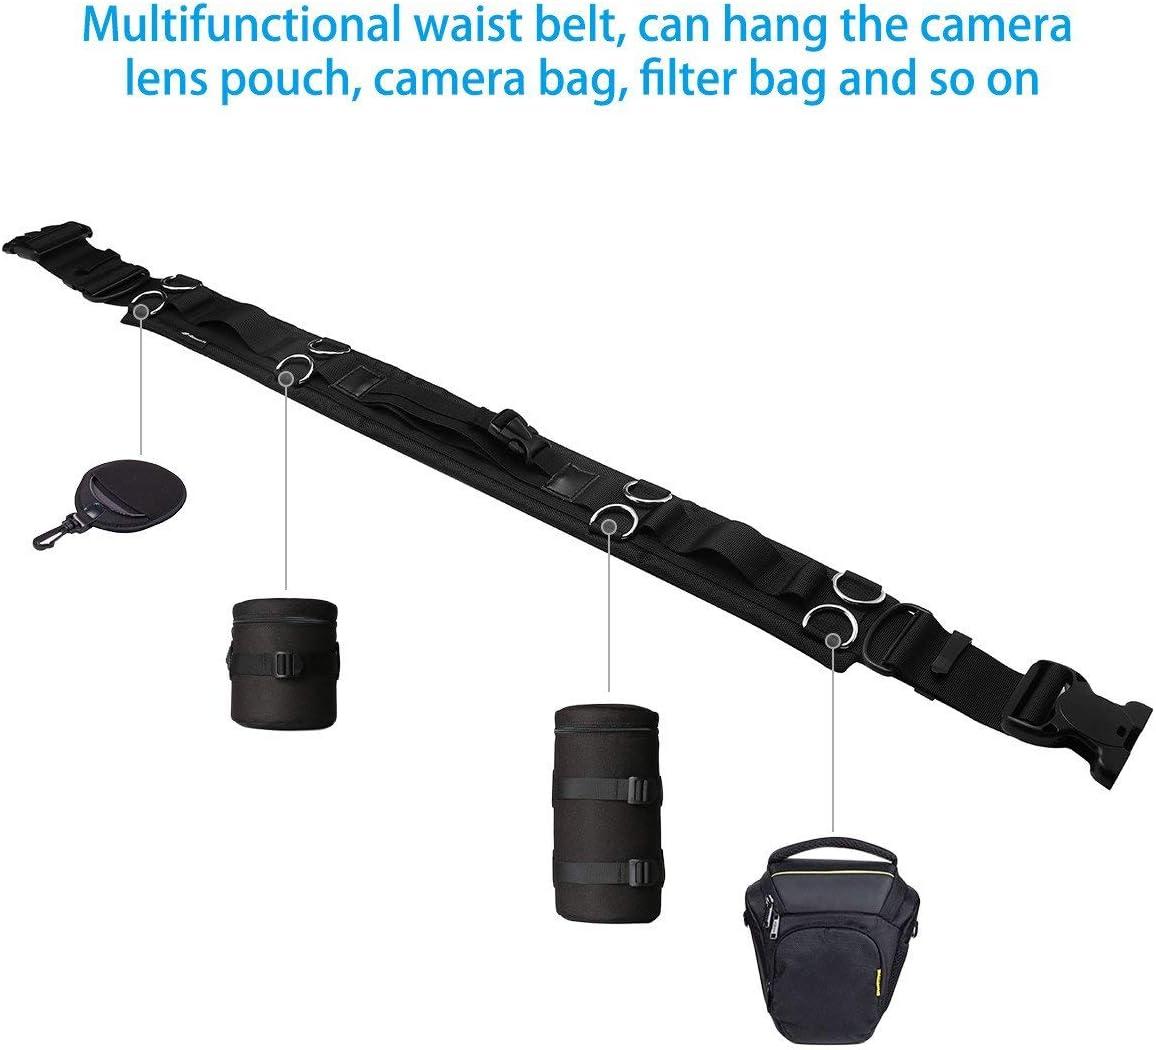 4X Zipper Lens Pouch Bag Professional Waterproof Camera Rain Cover Bundle Outdoor Photography Adjustable Waist Strap